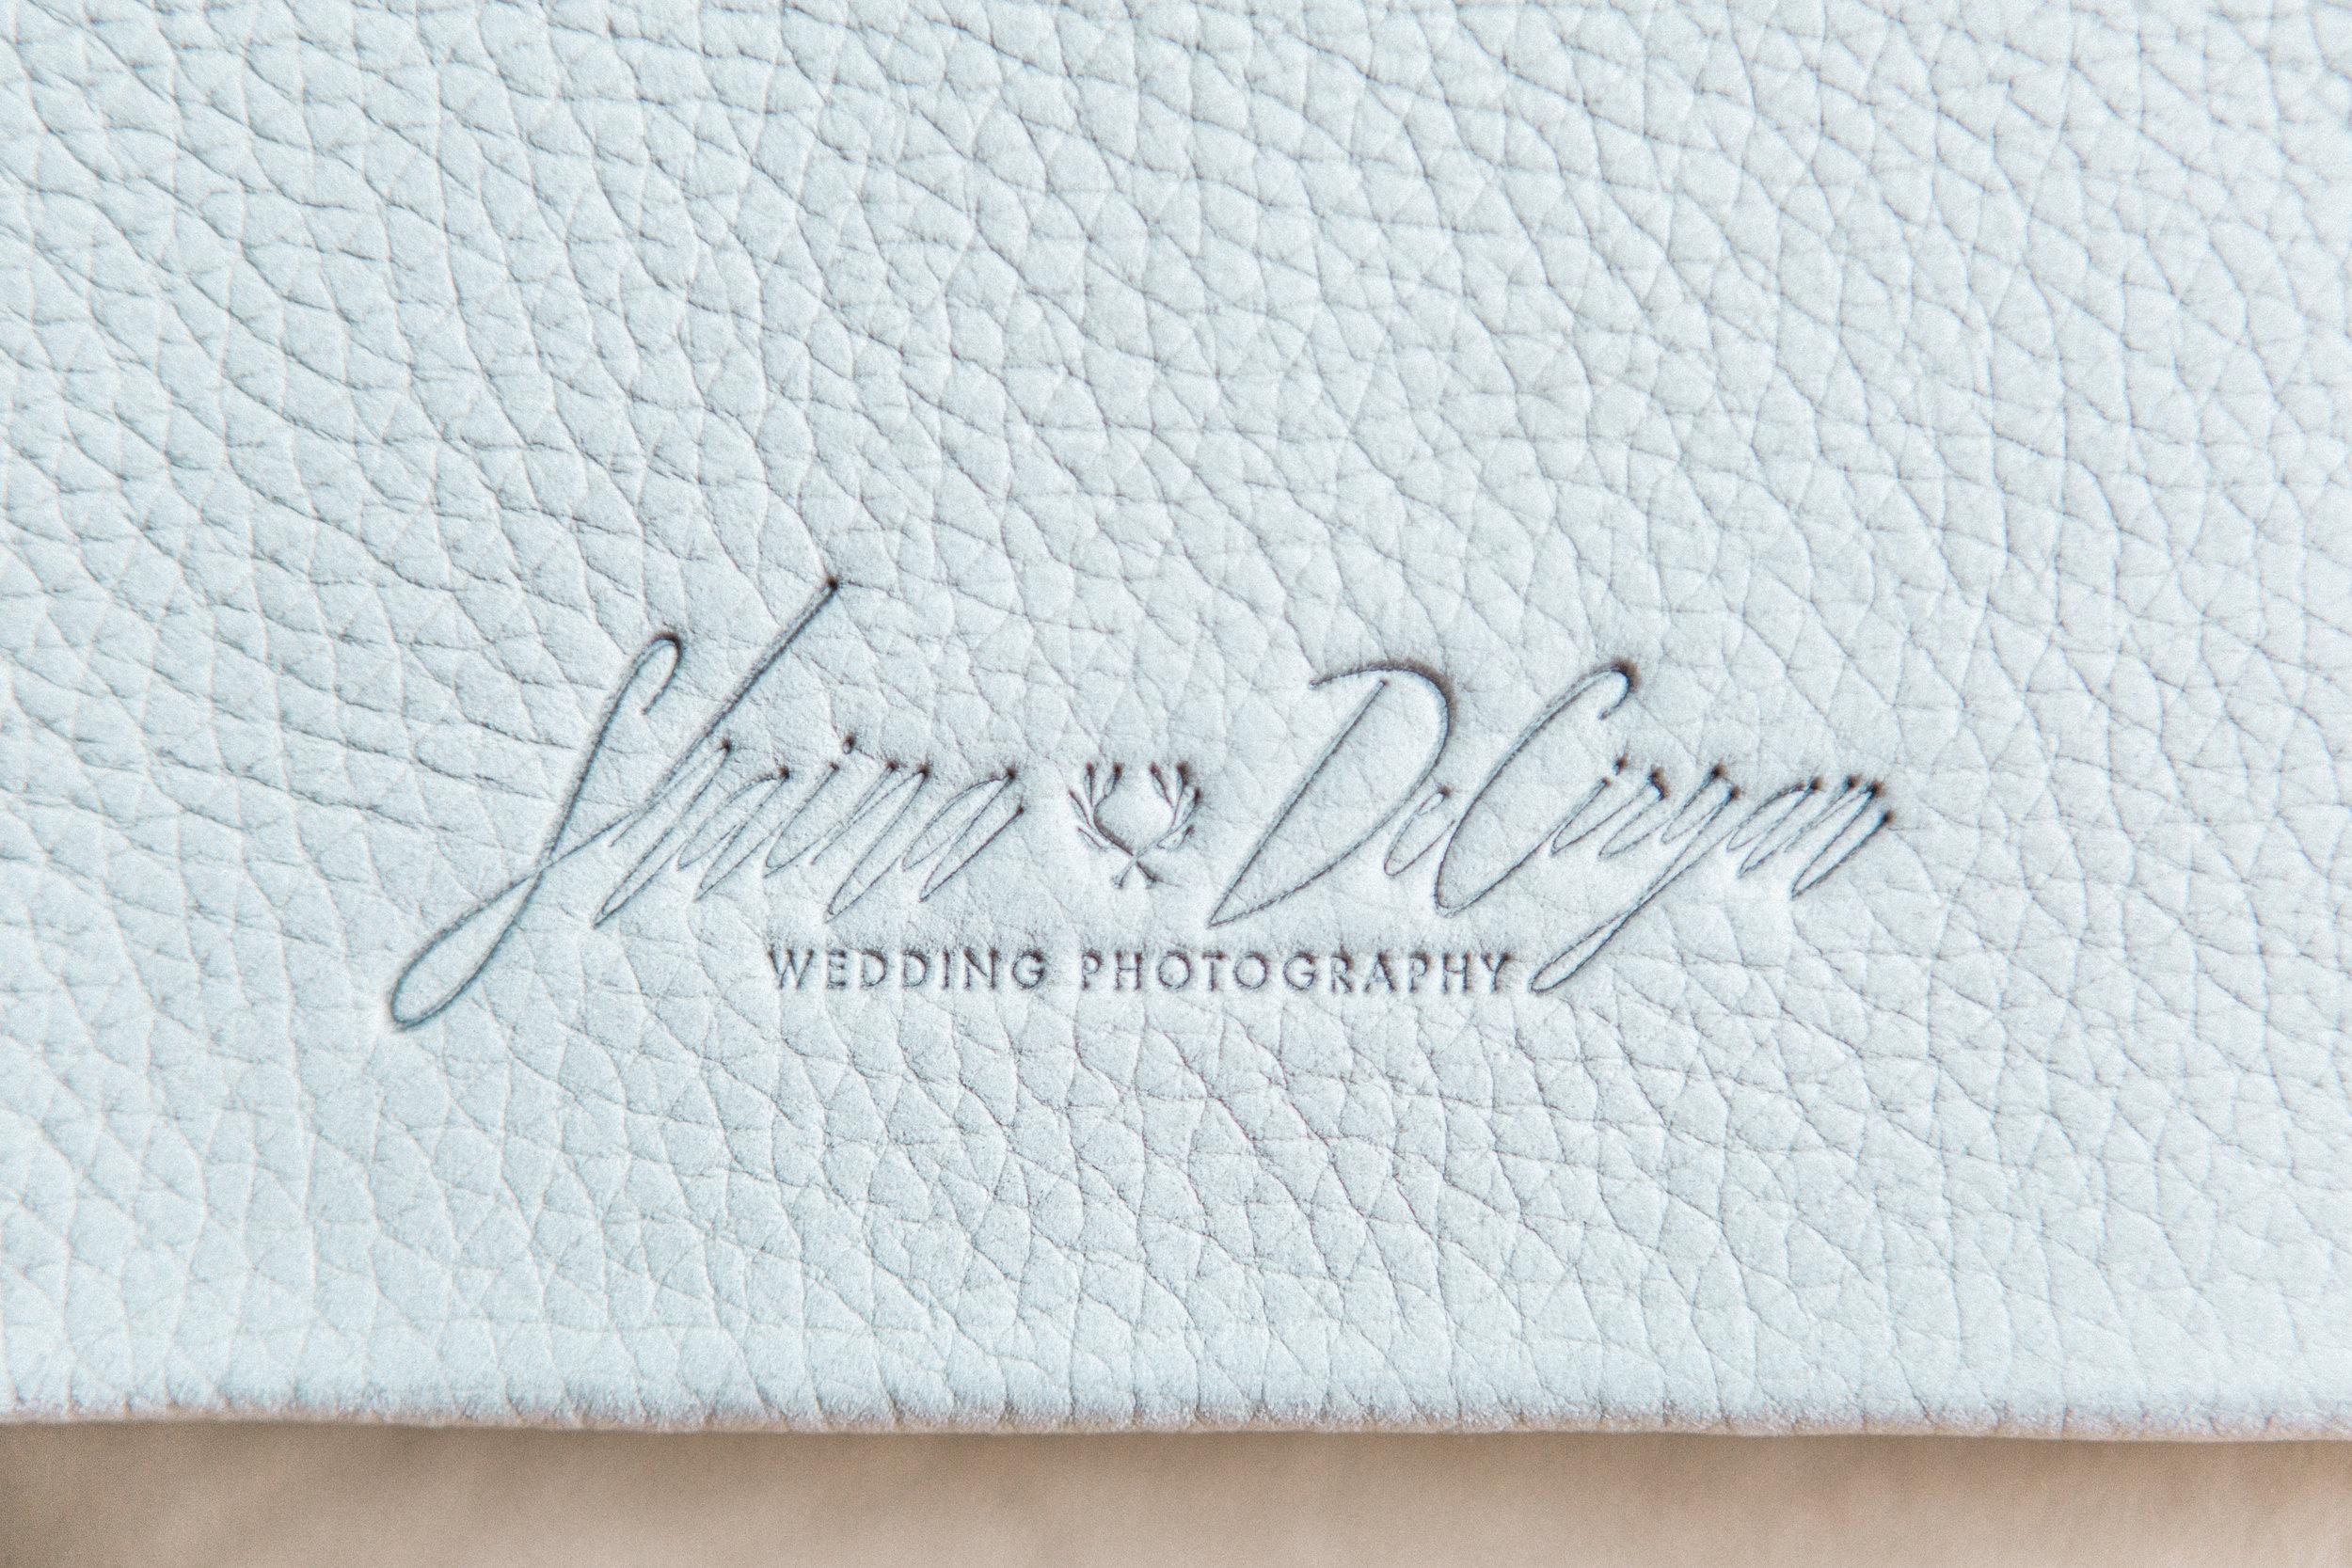 Fog Lux Leather wedding album designed by Winter Park Wedding photographer Shaina DeCiryan